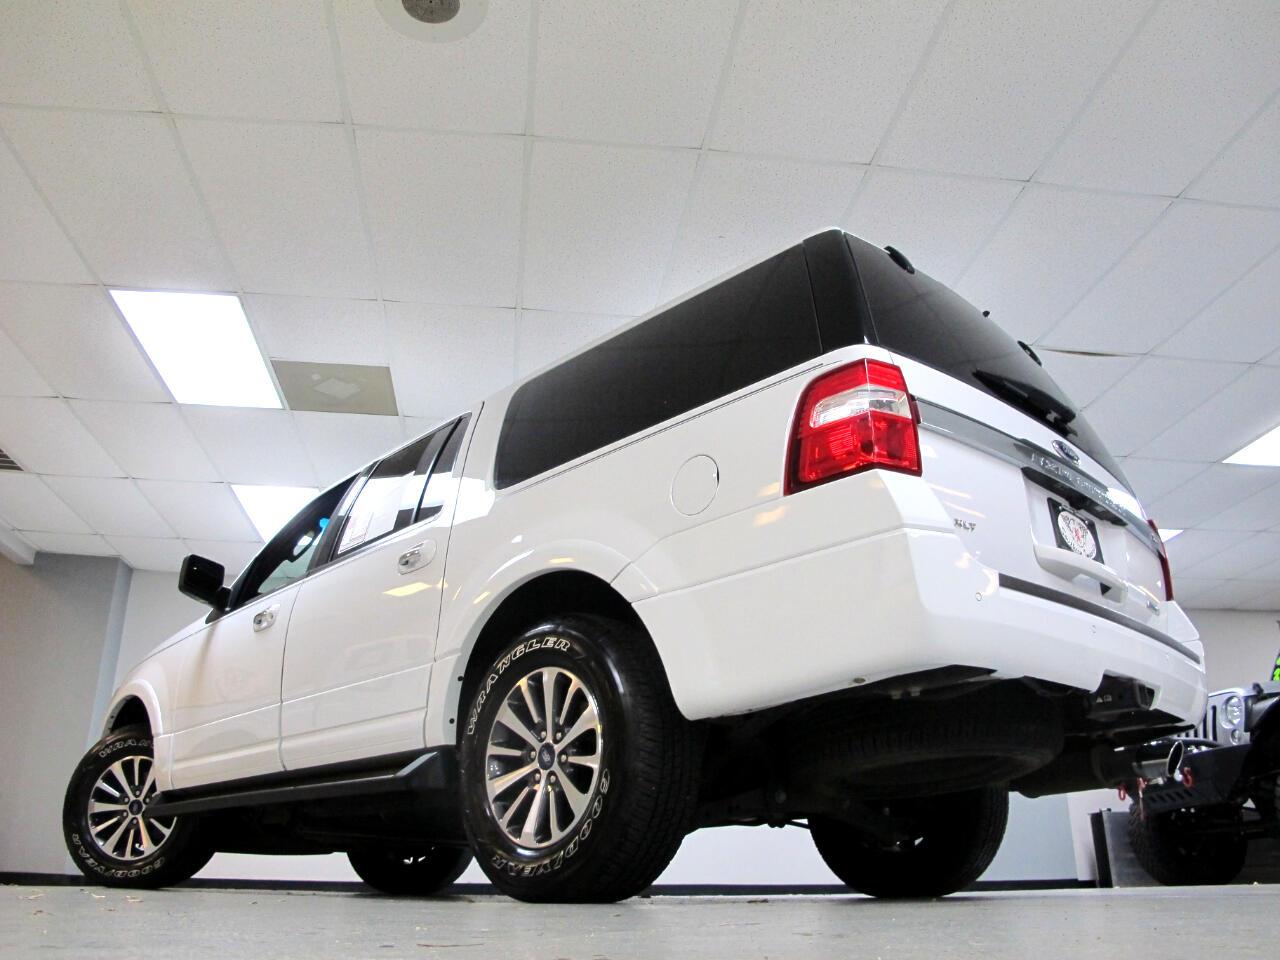 2015 Ford Expedition EL 2WD 4dr XLT